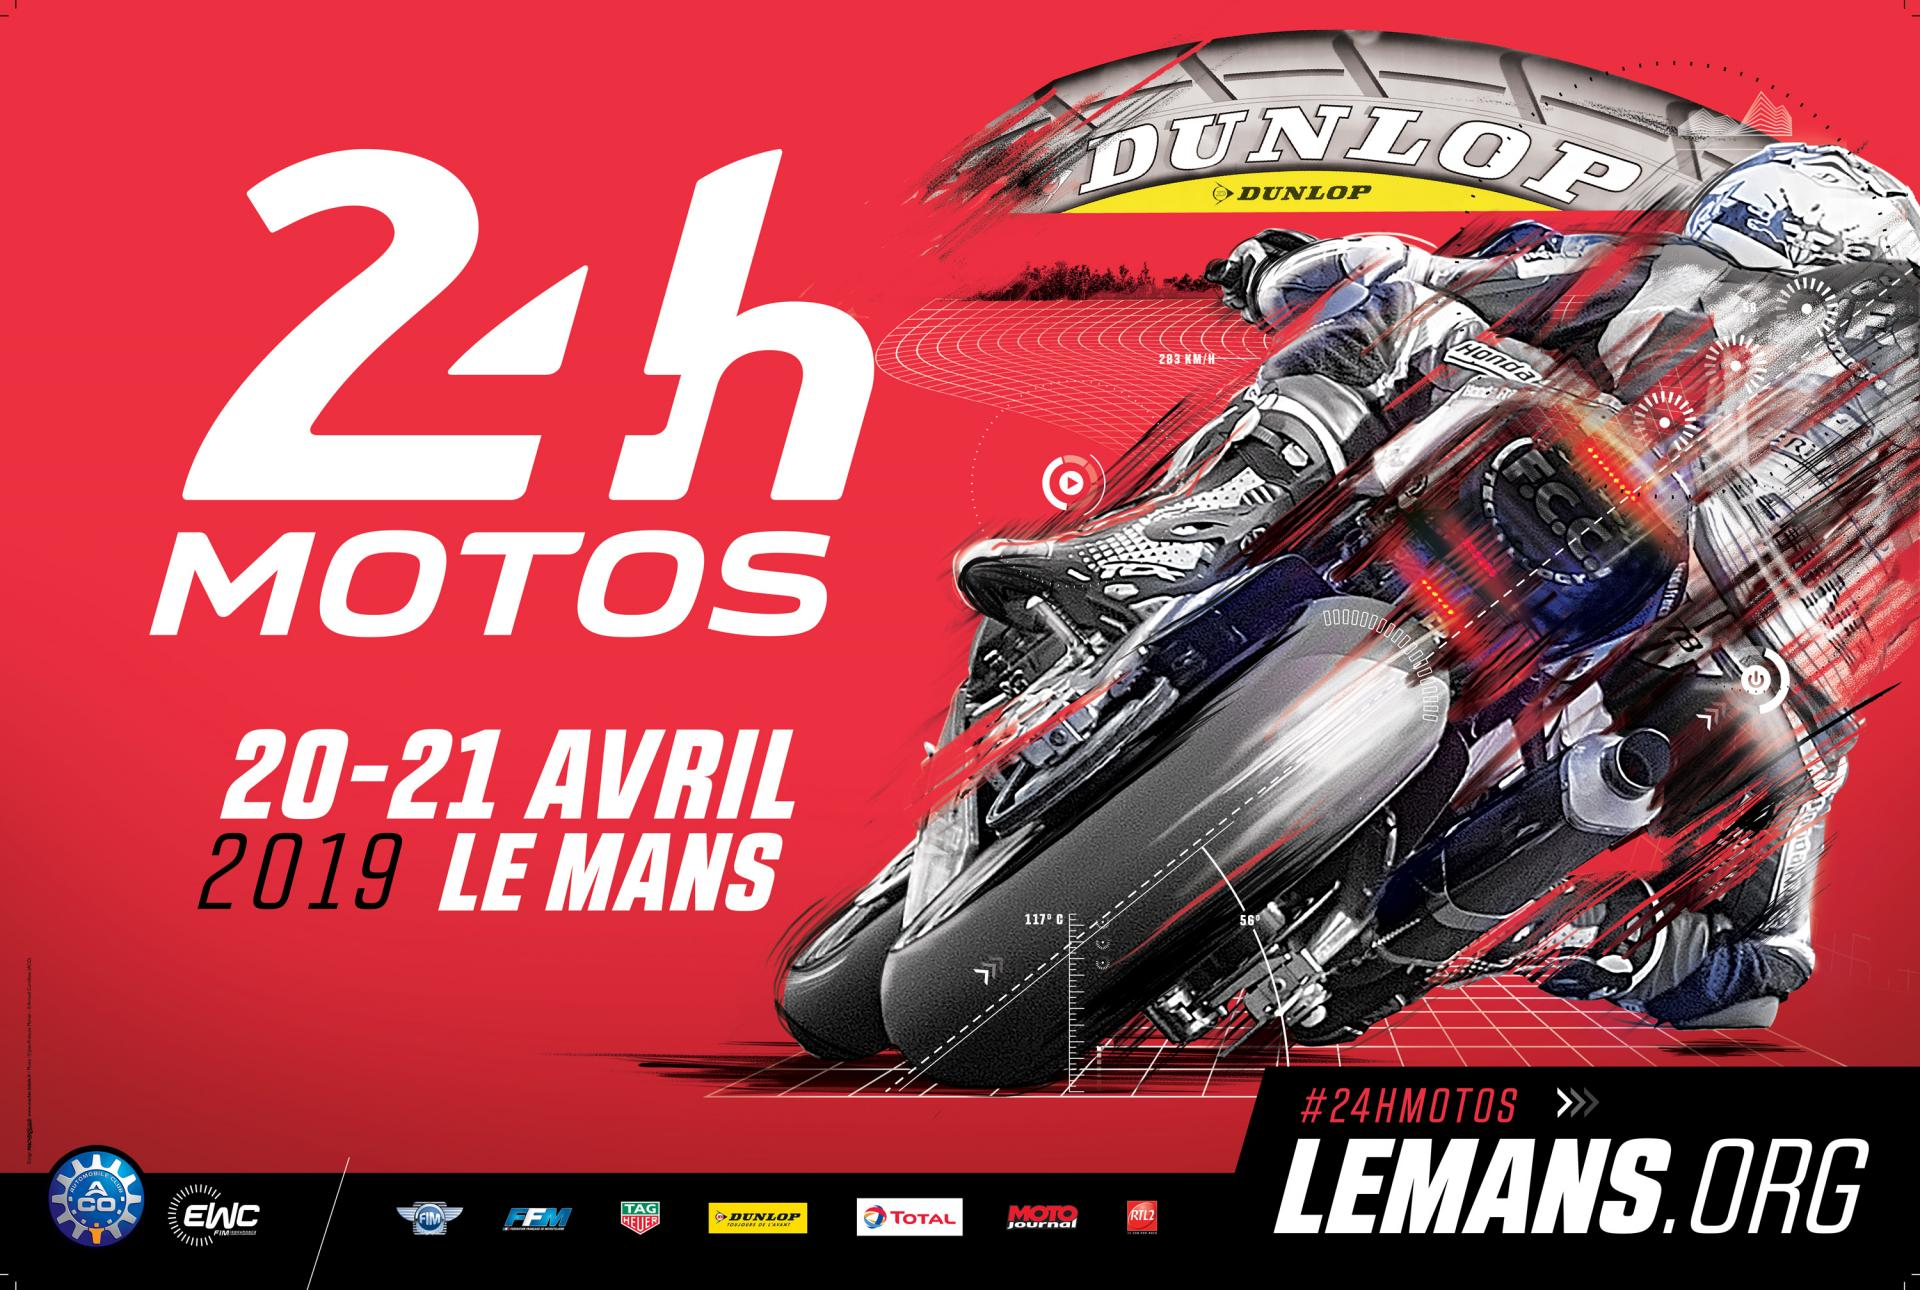 Affiche 24 heures motos 2019